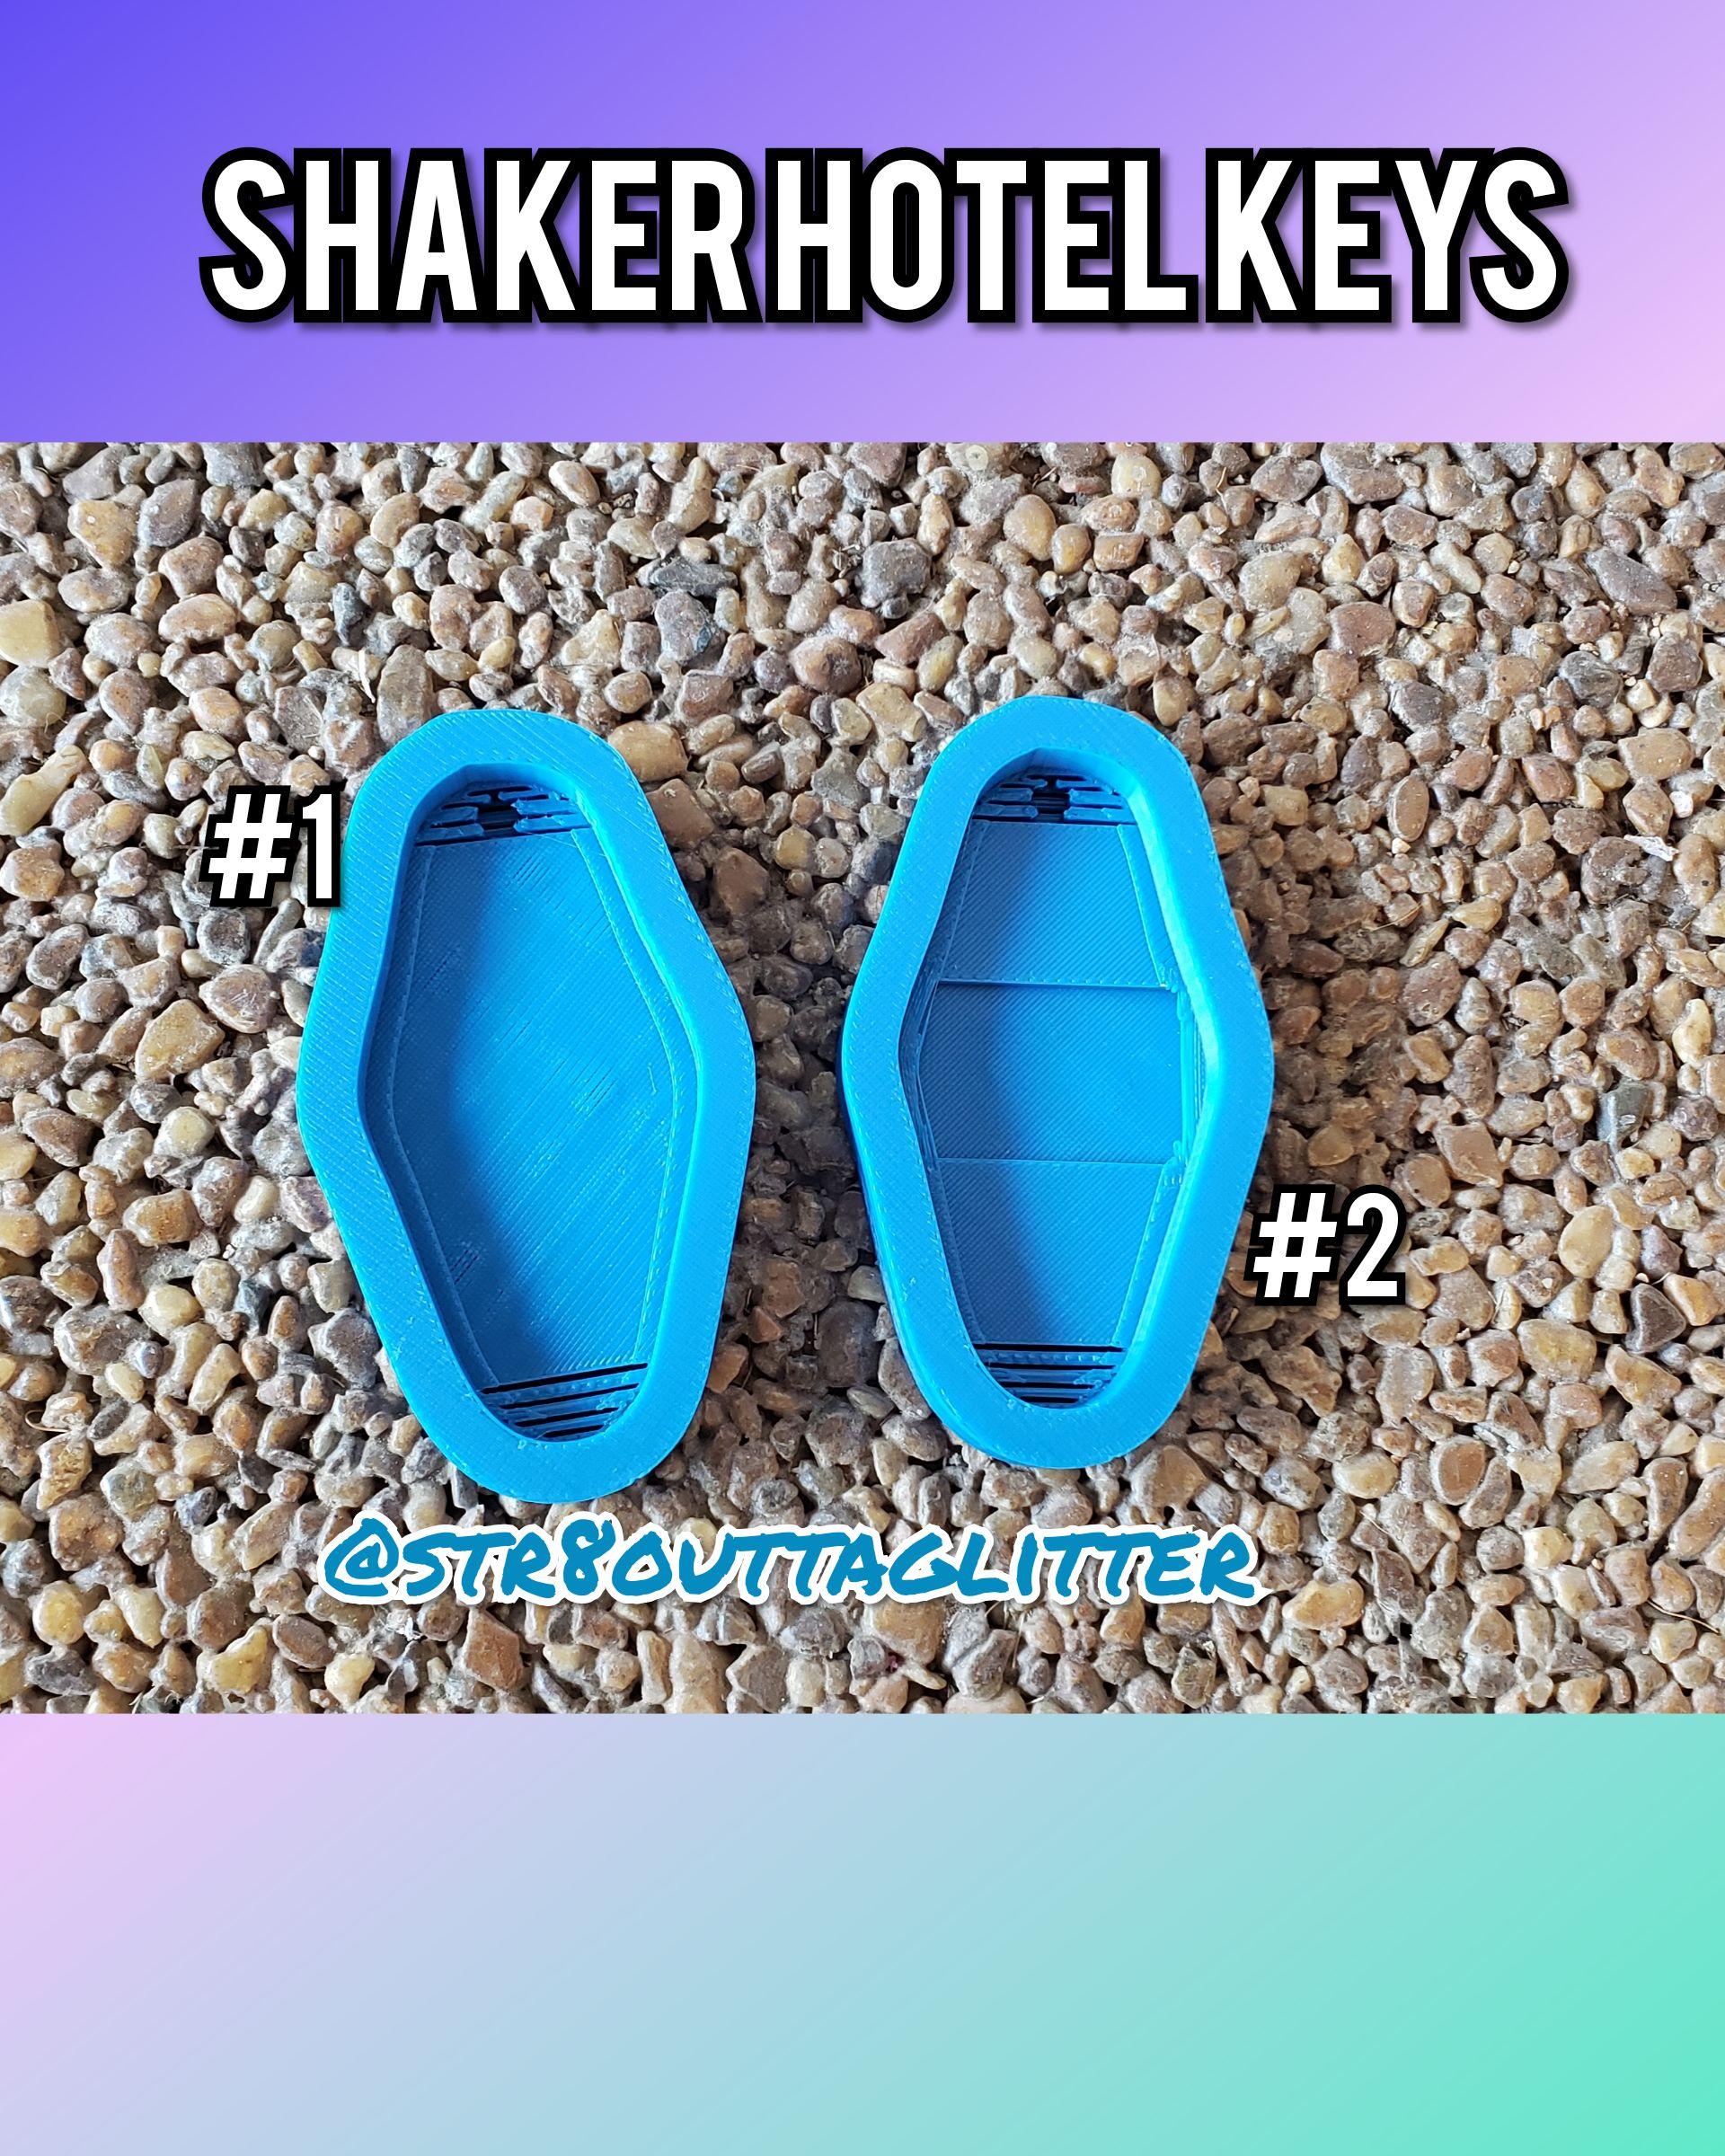 Blank Shaker Hotel Keys Straight Outta Glitter Online Store